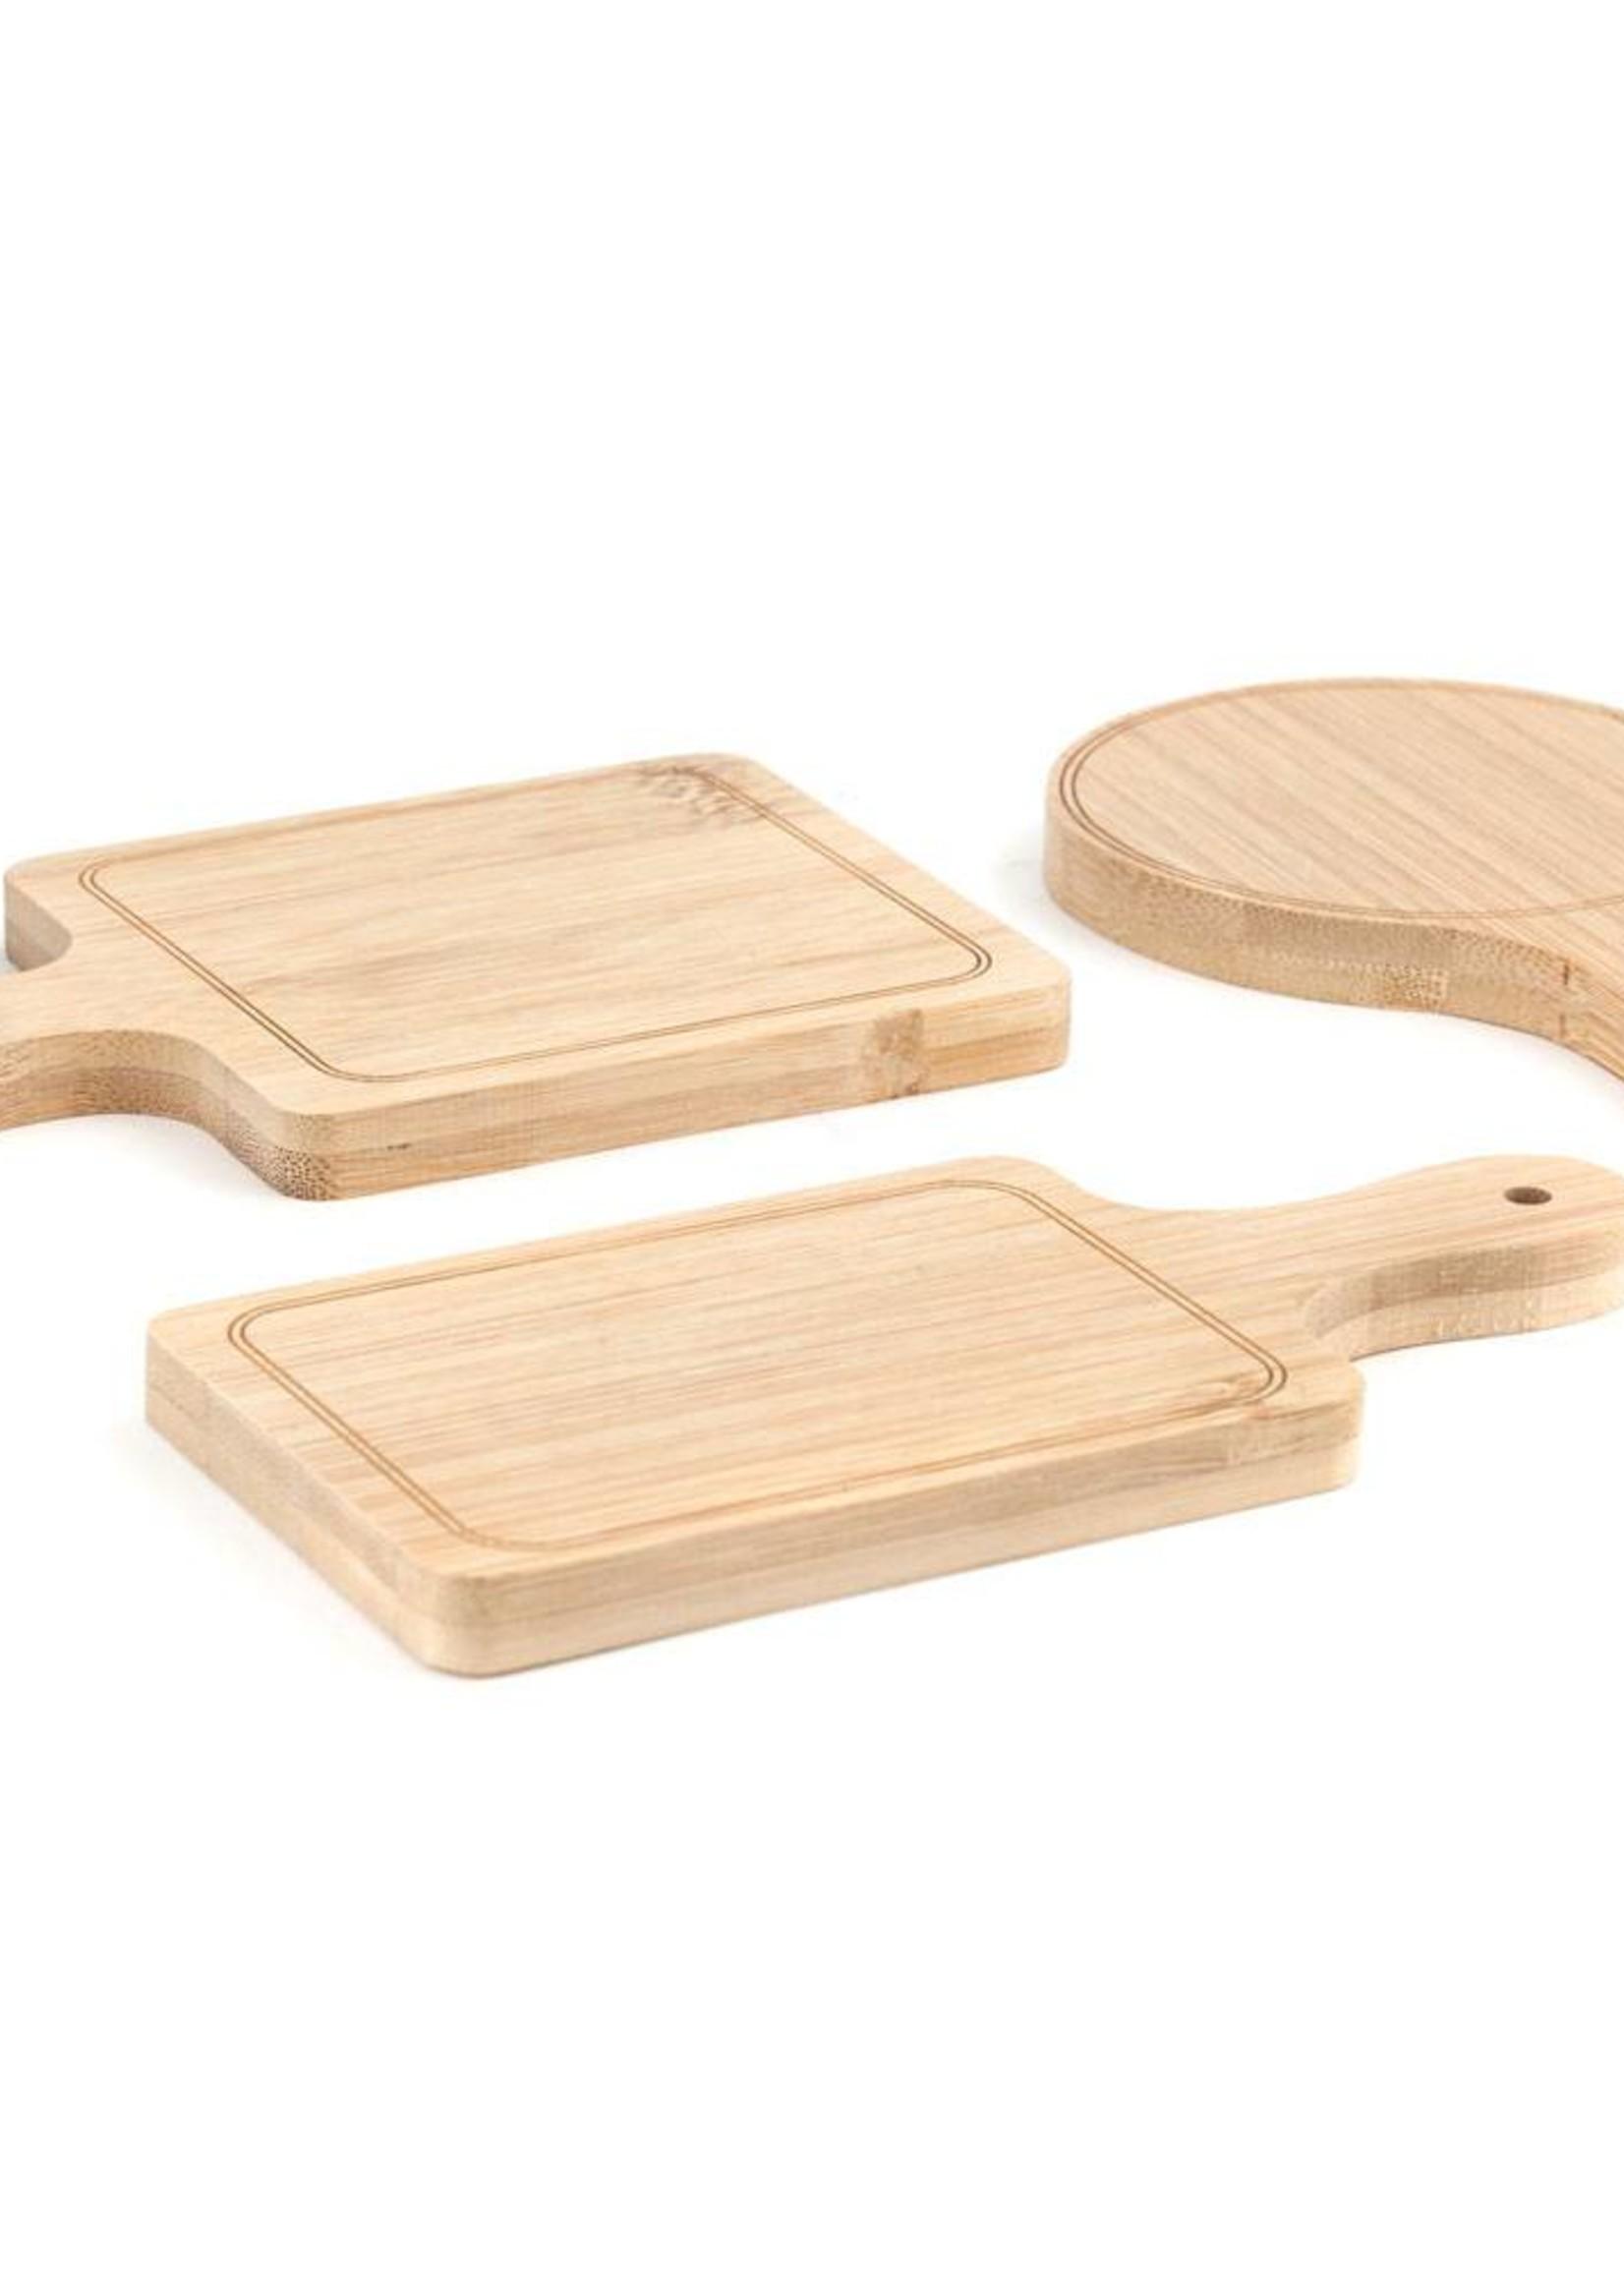 Kikkerland Mini Cutting Boards